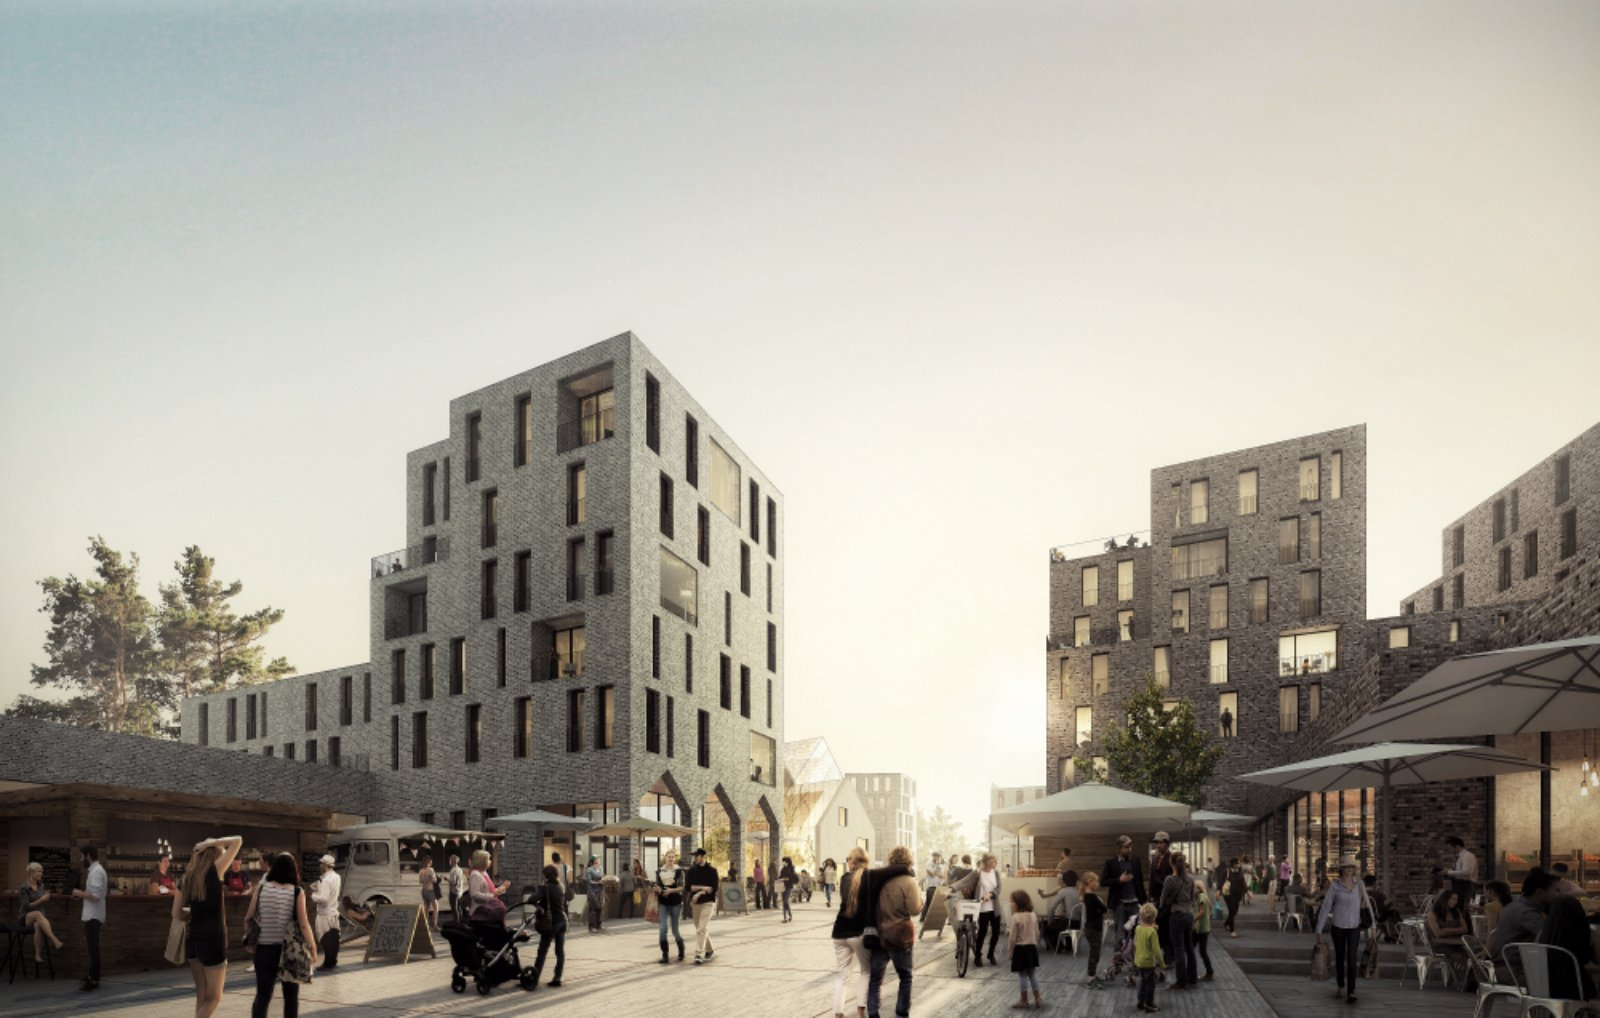 Image © C.F. Møller Architects